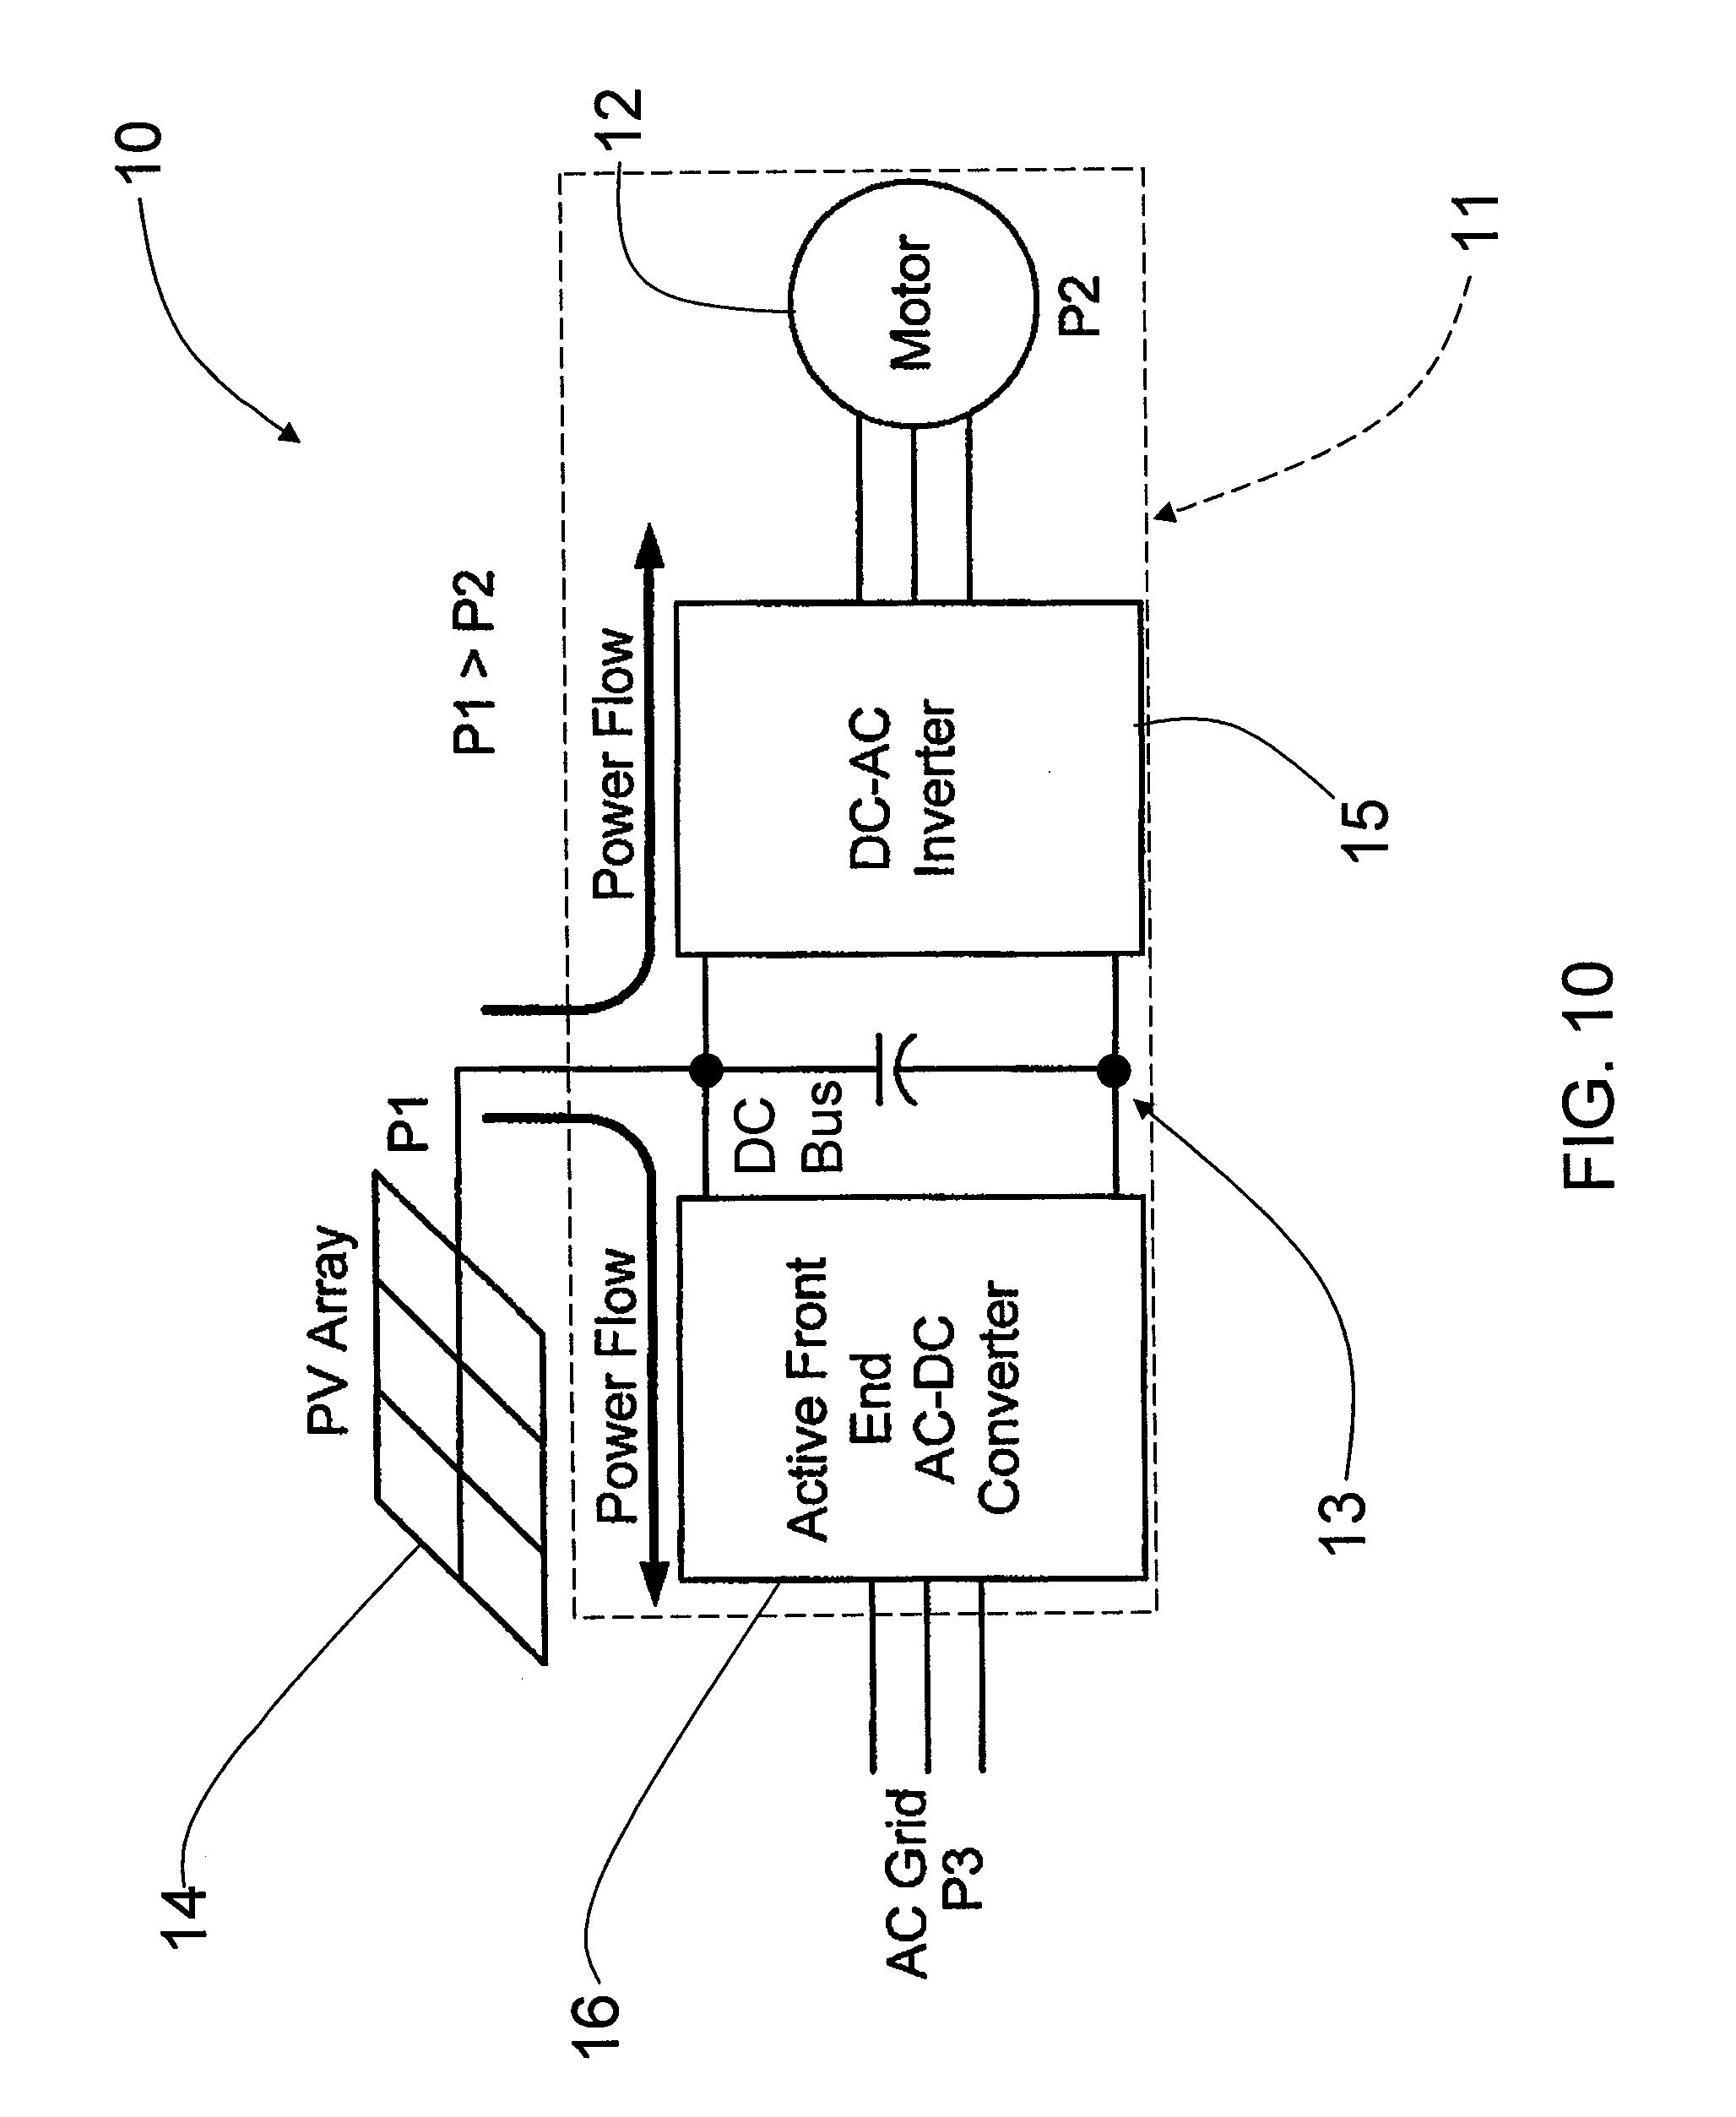 Omron Vfd Wiring Diagram